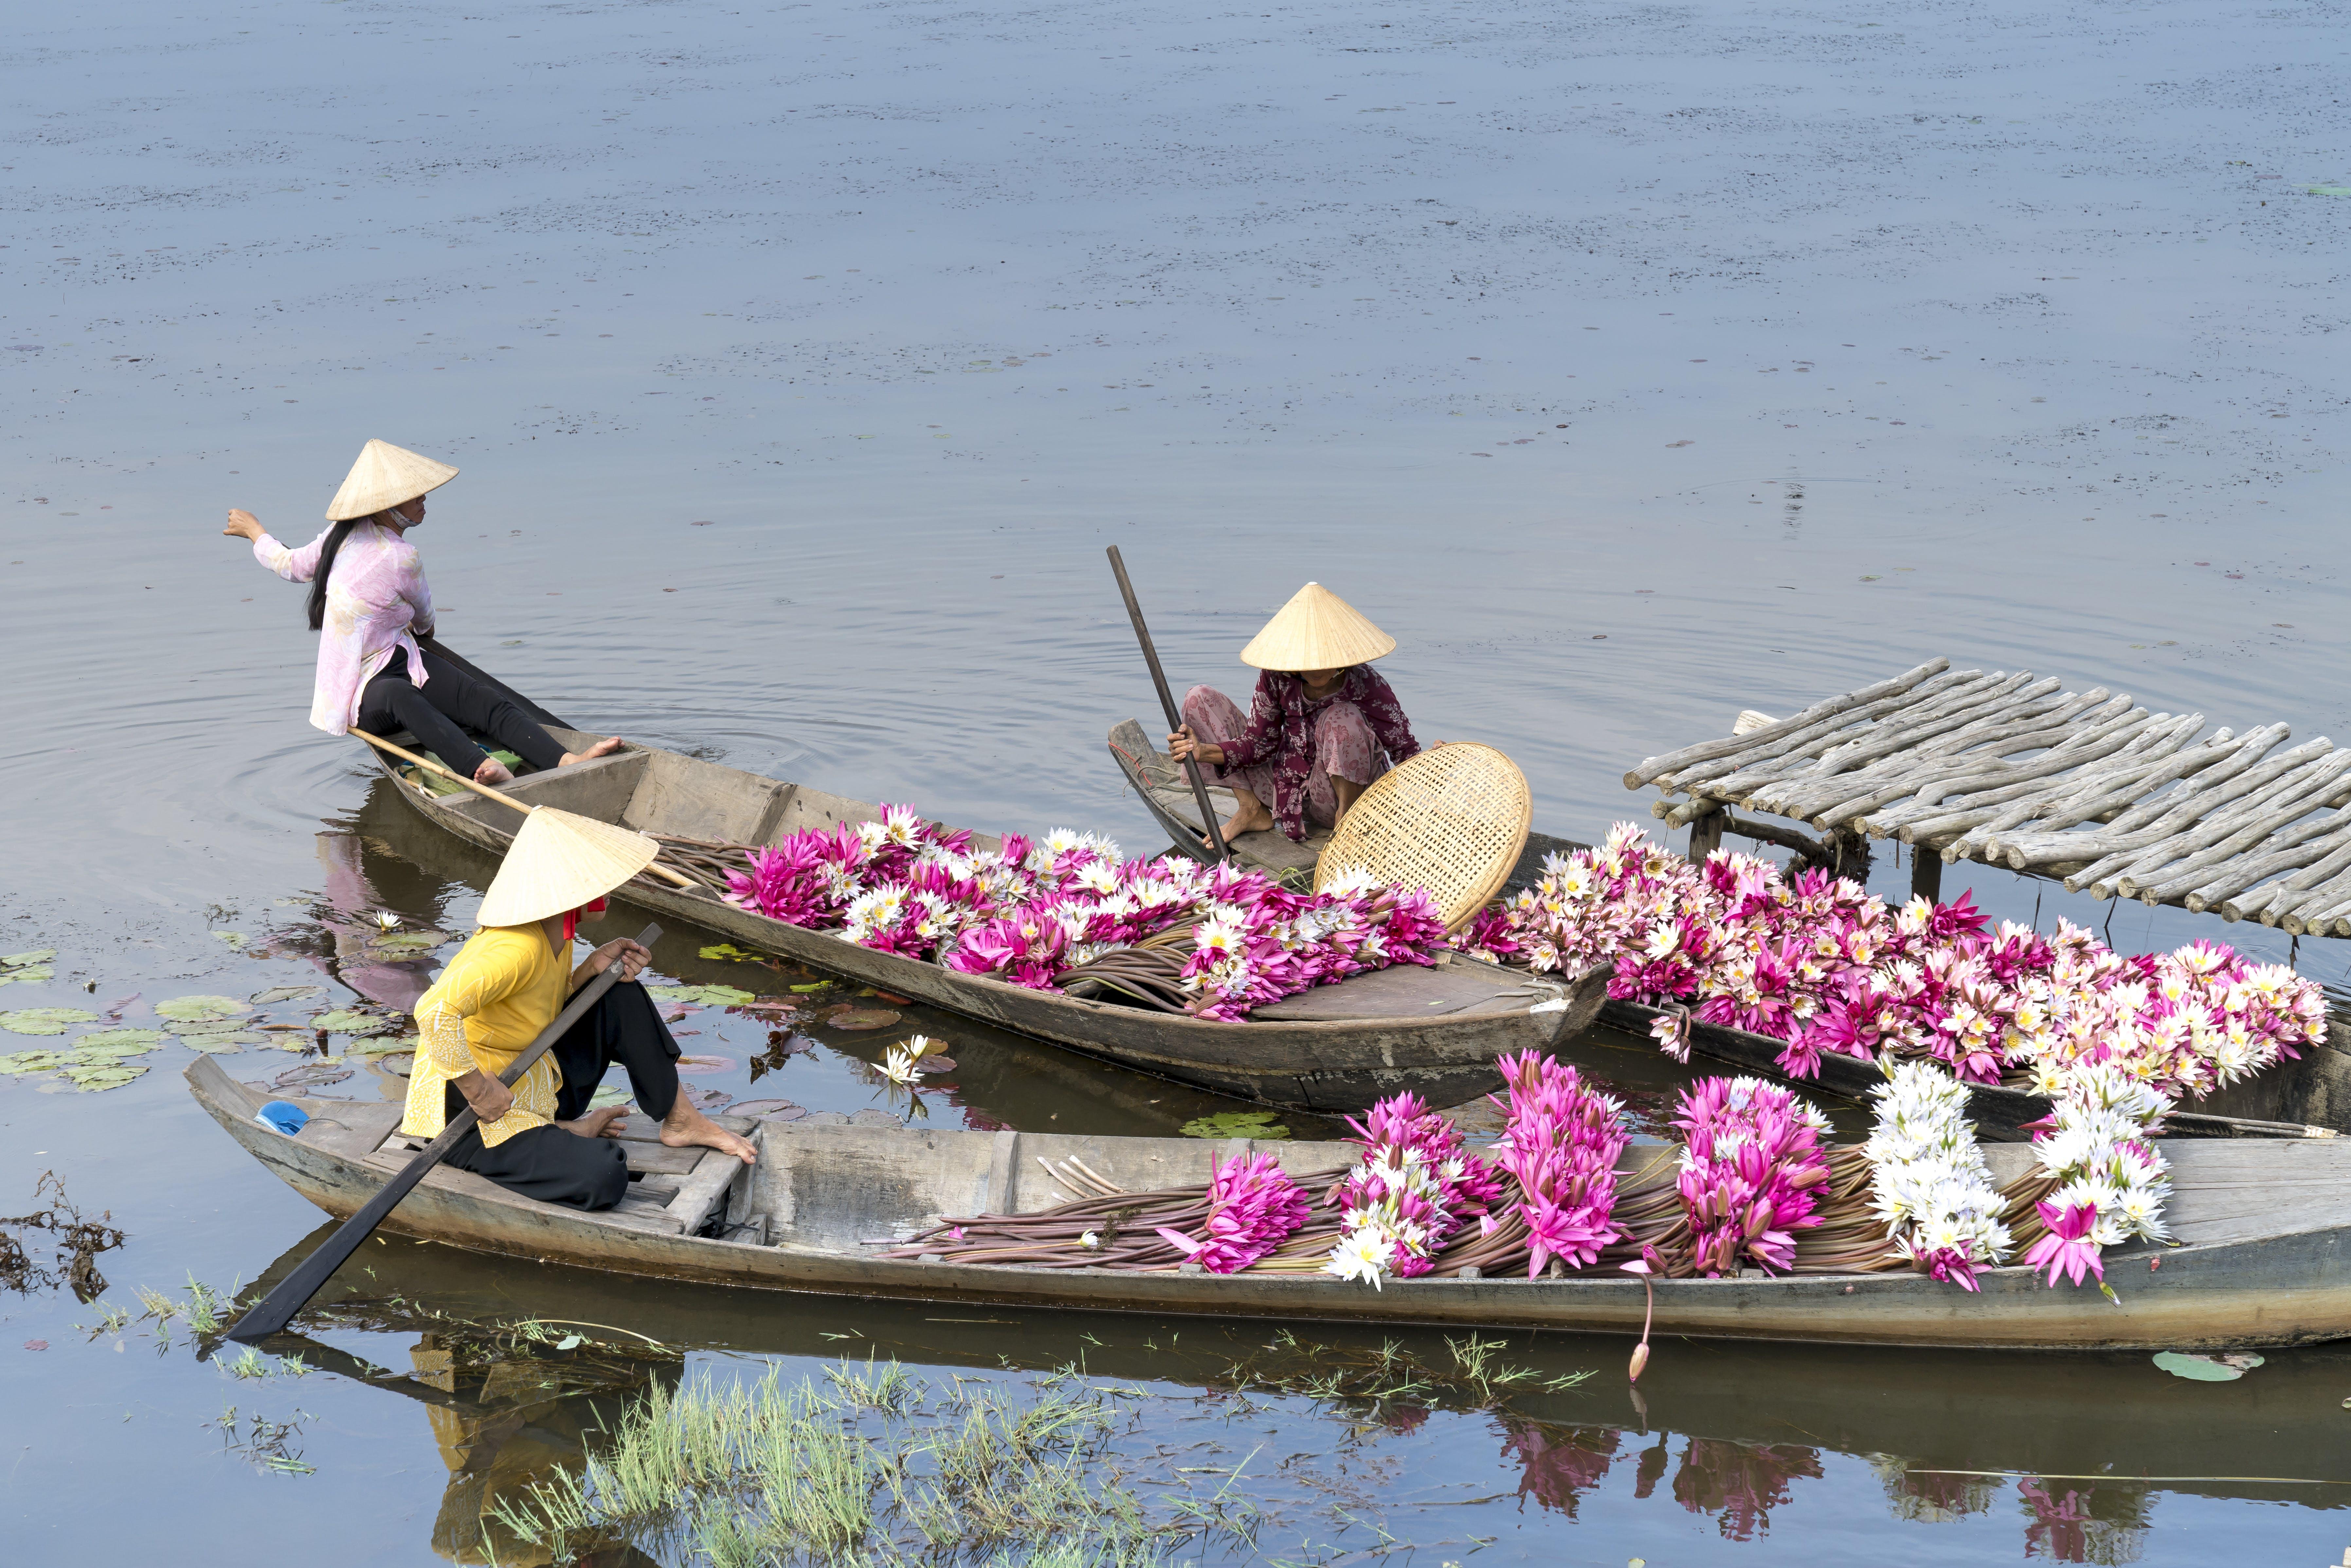 Three Women Sitting On Boats